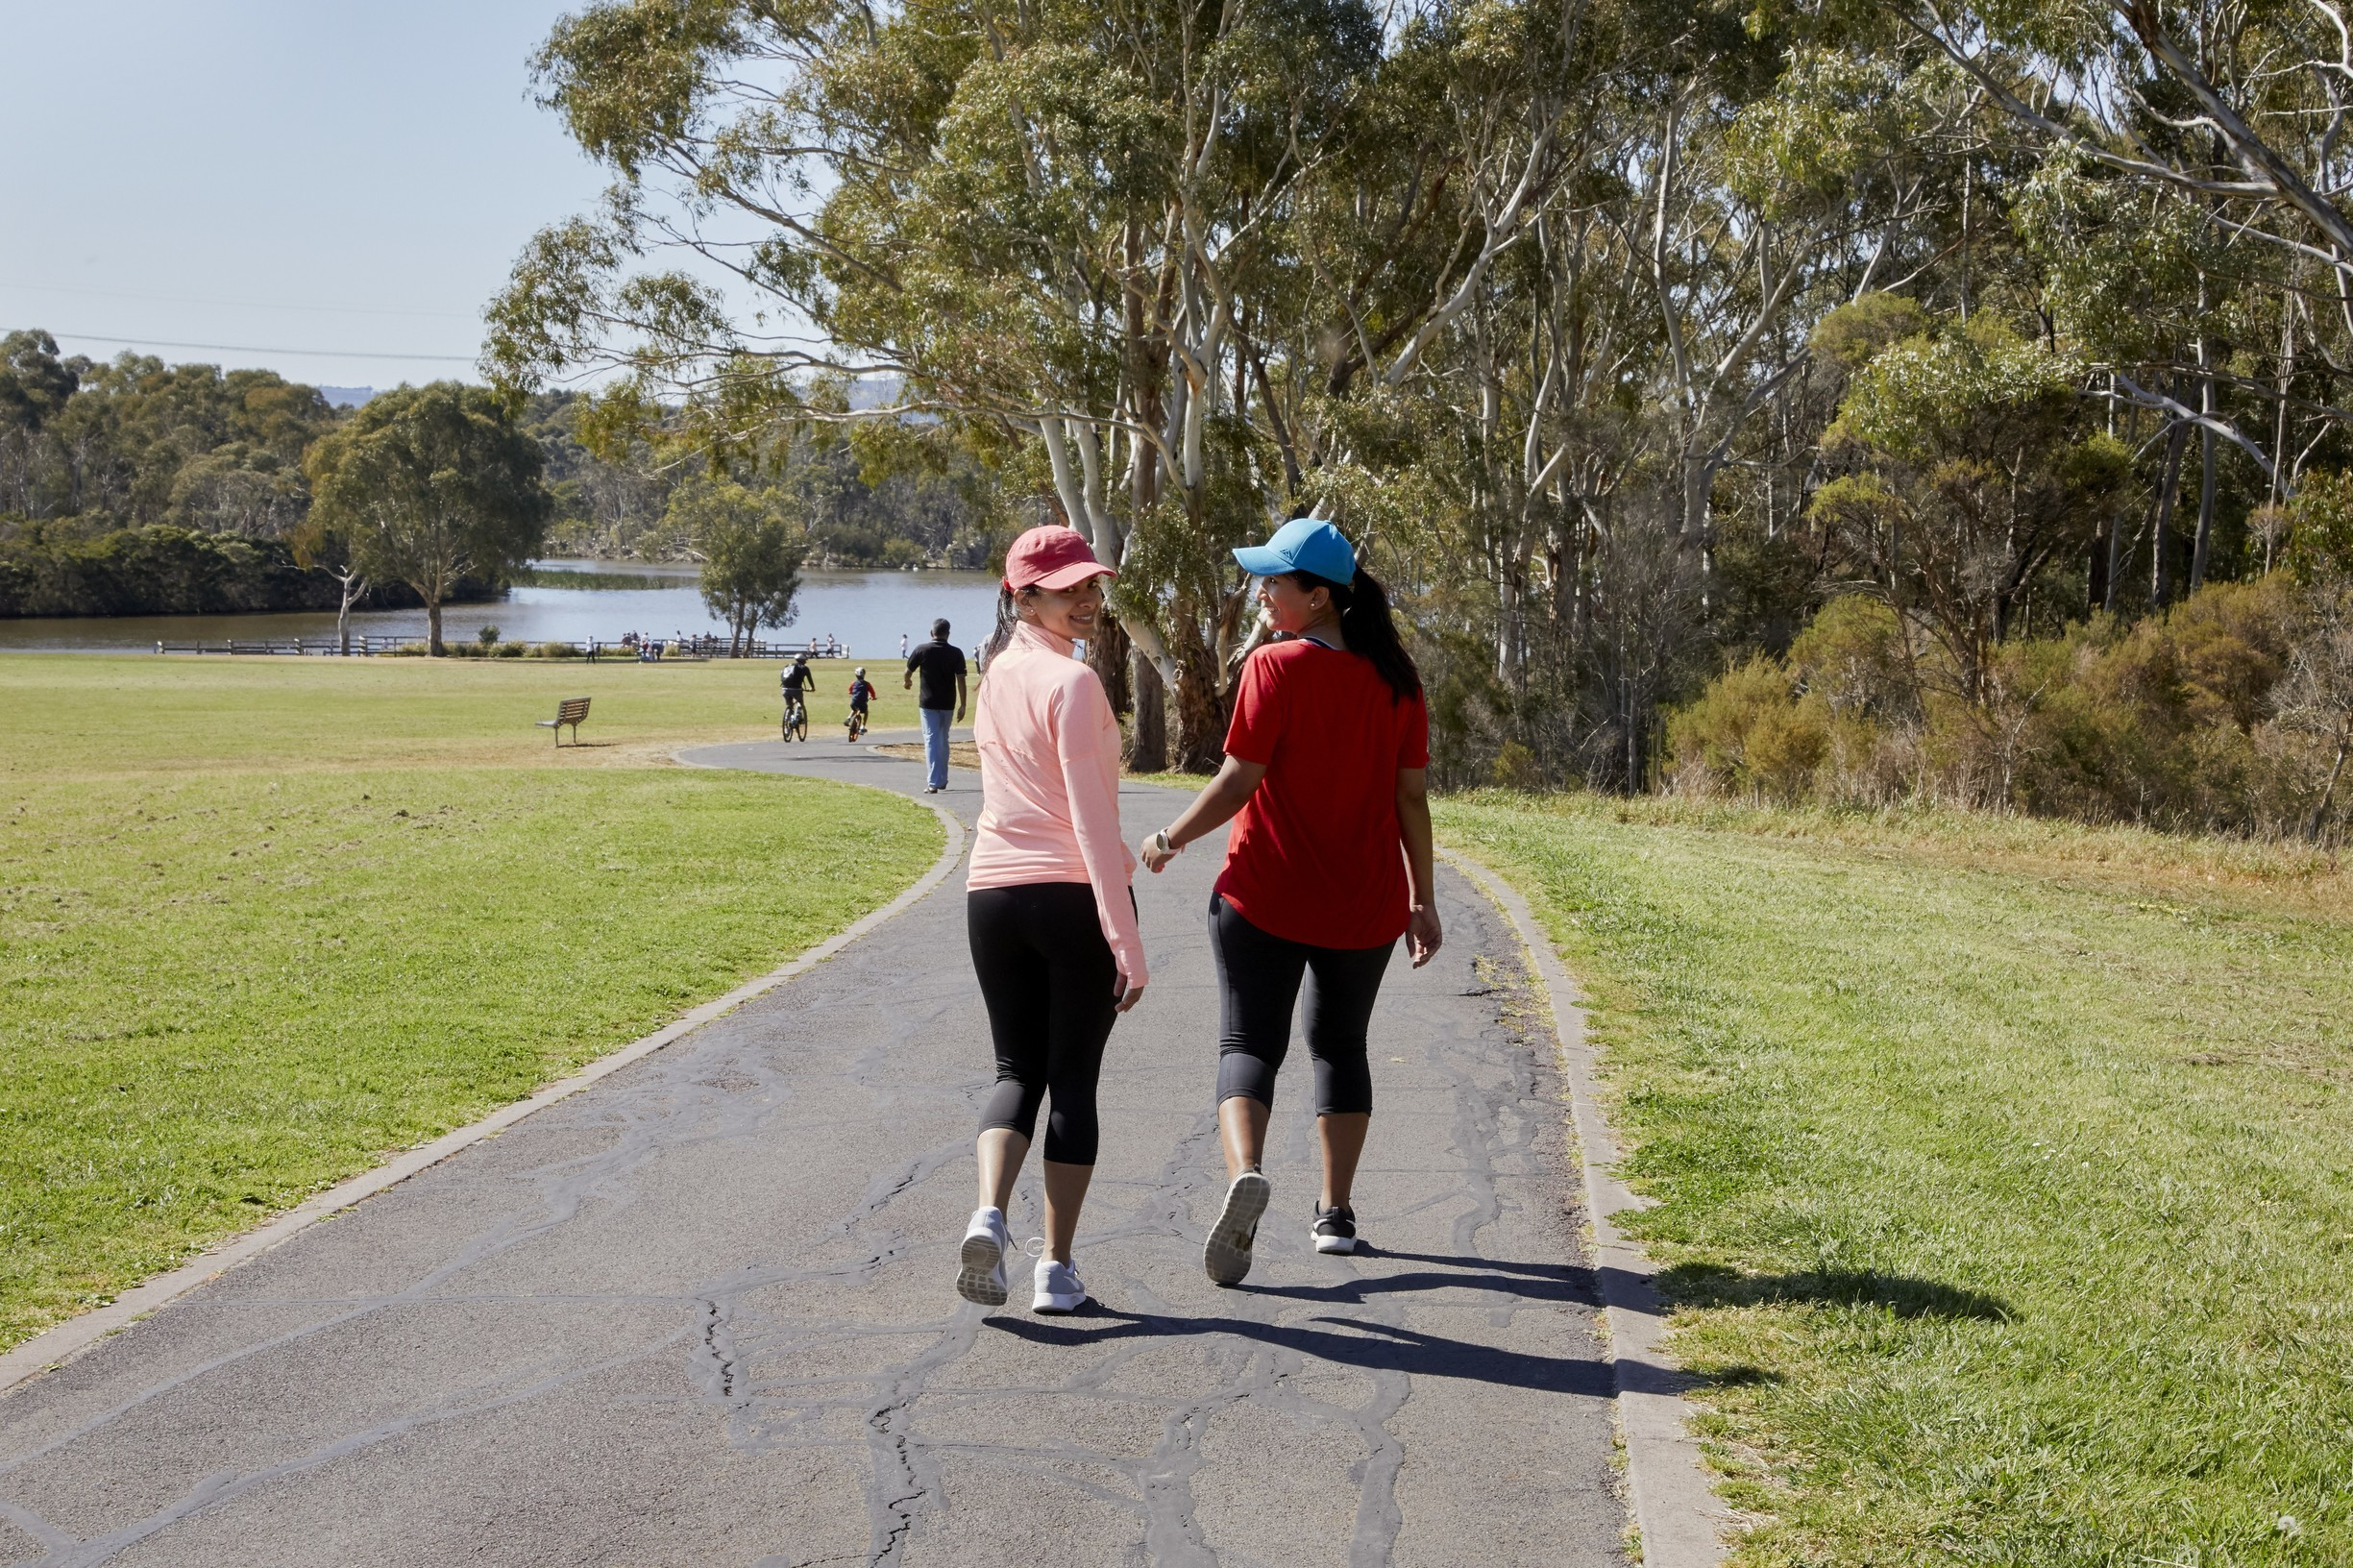 Walks around the lake, Jells Park